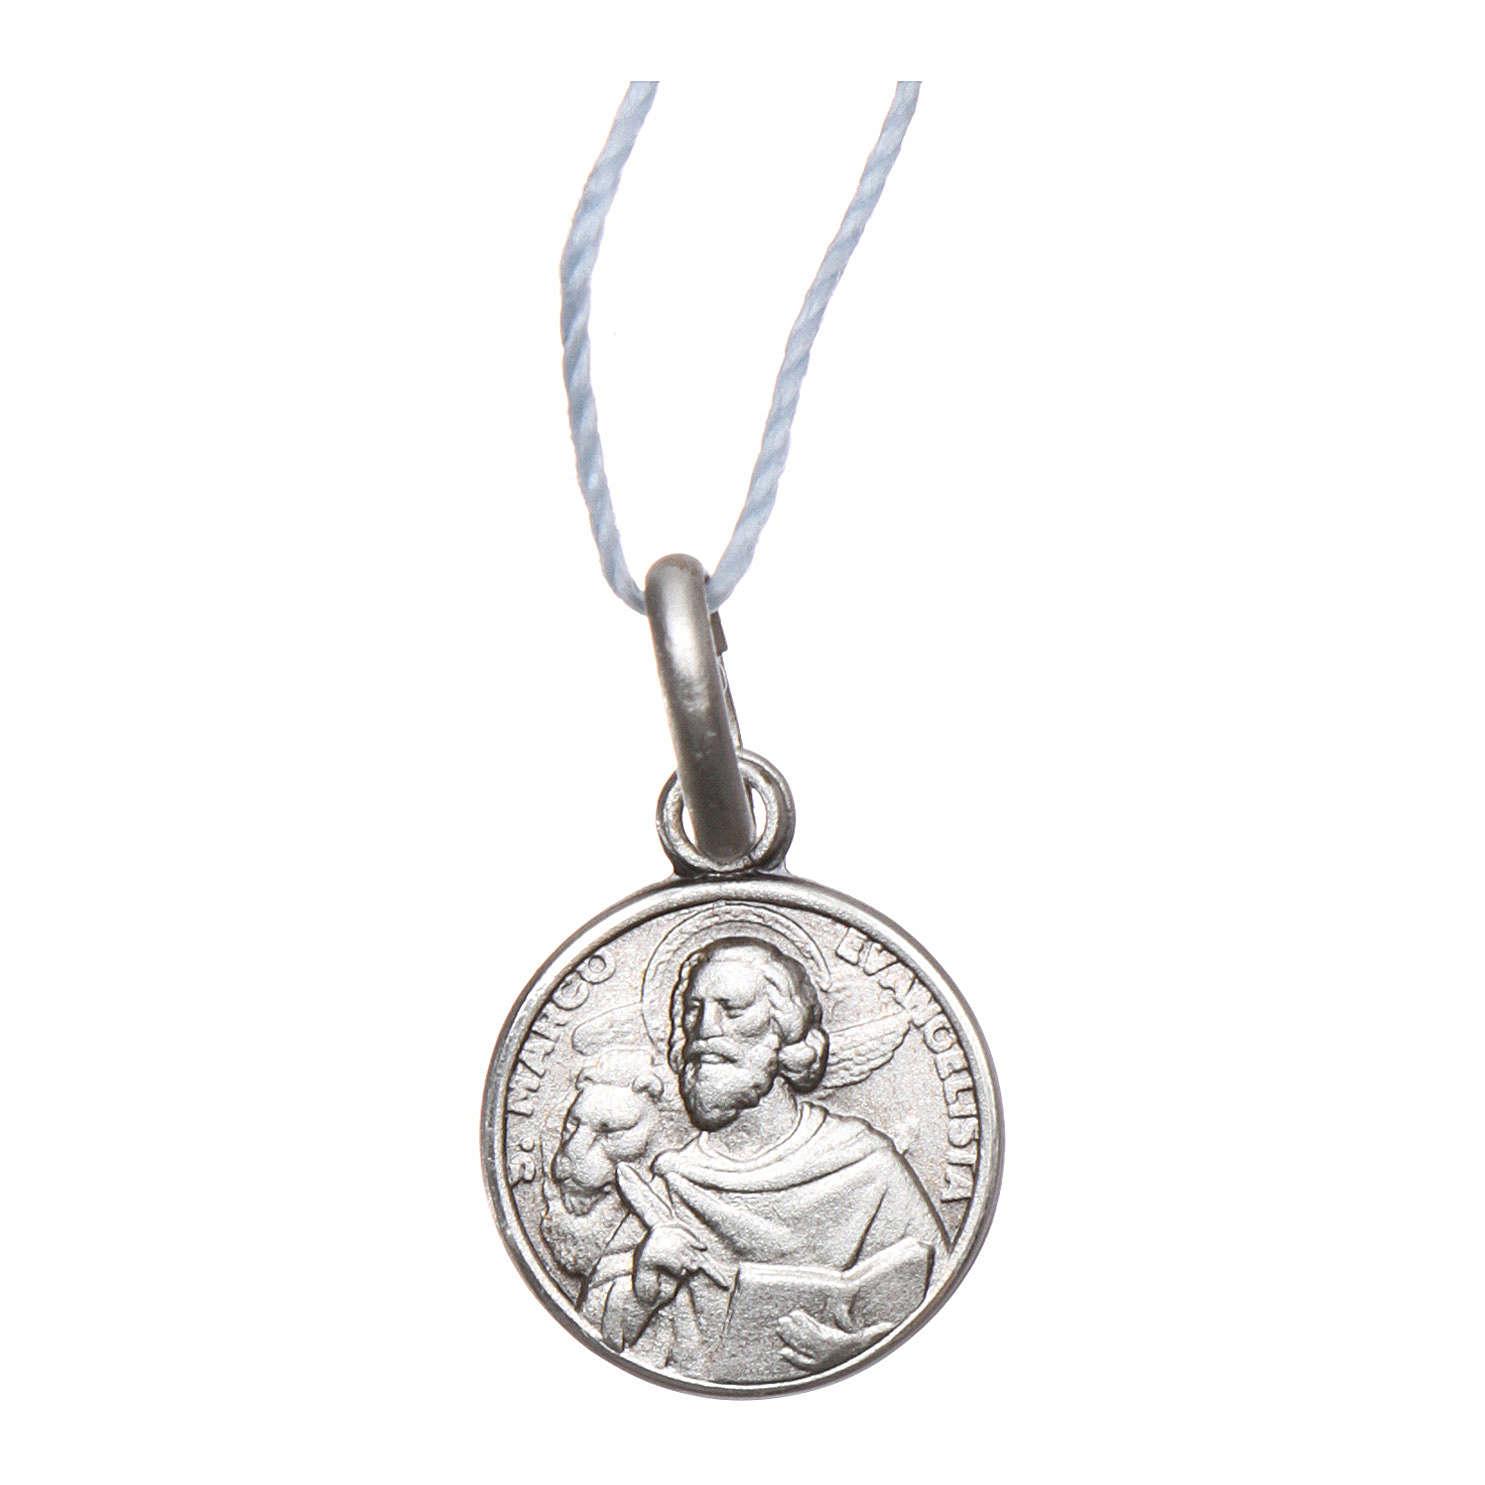 Medaglia San Marco Evangelista Argento 925 rodiata 10 mm 4